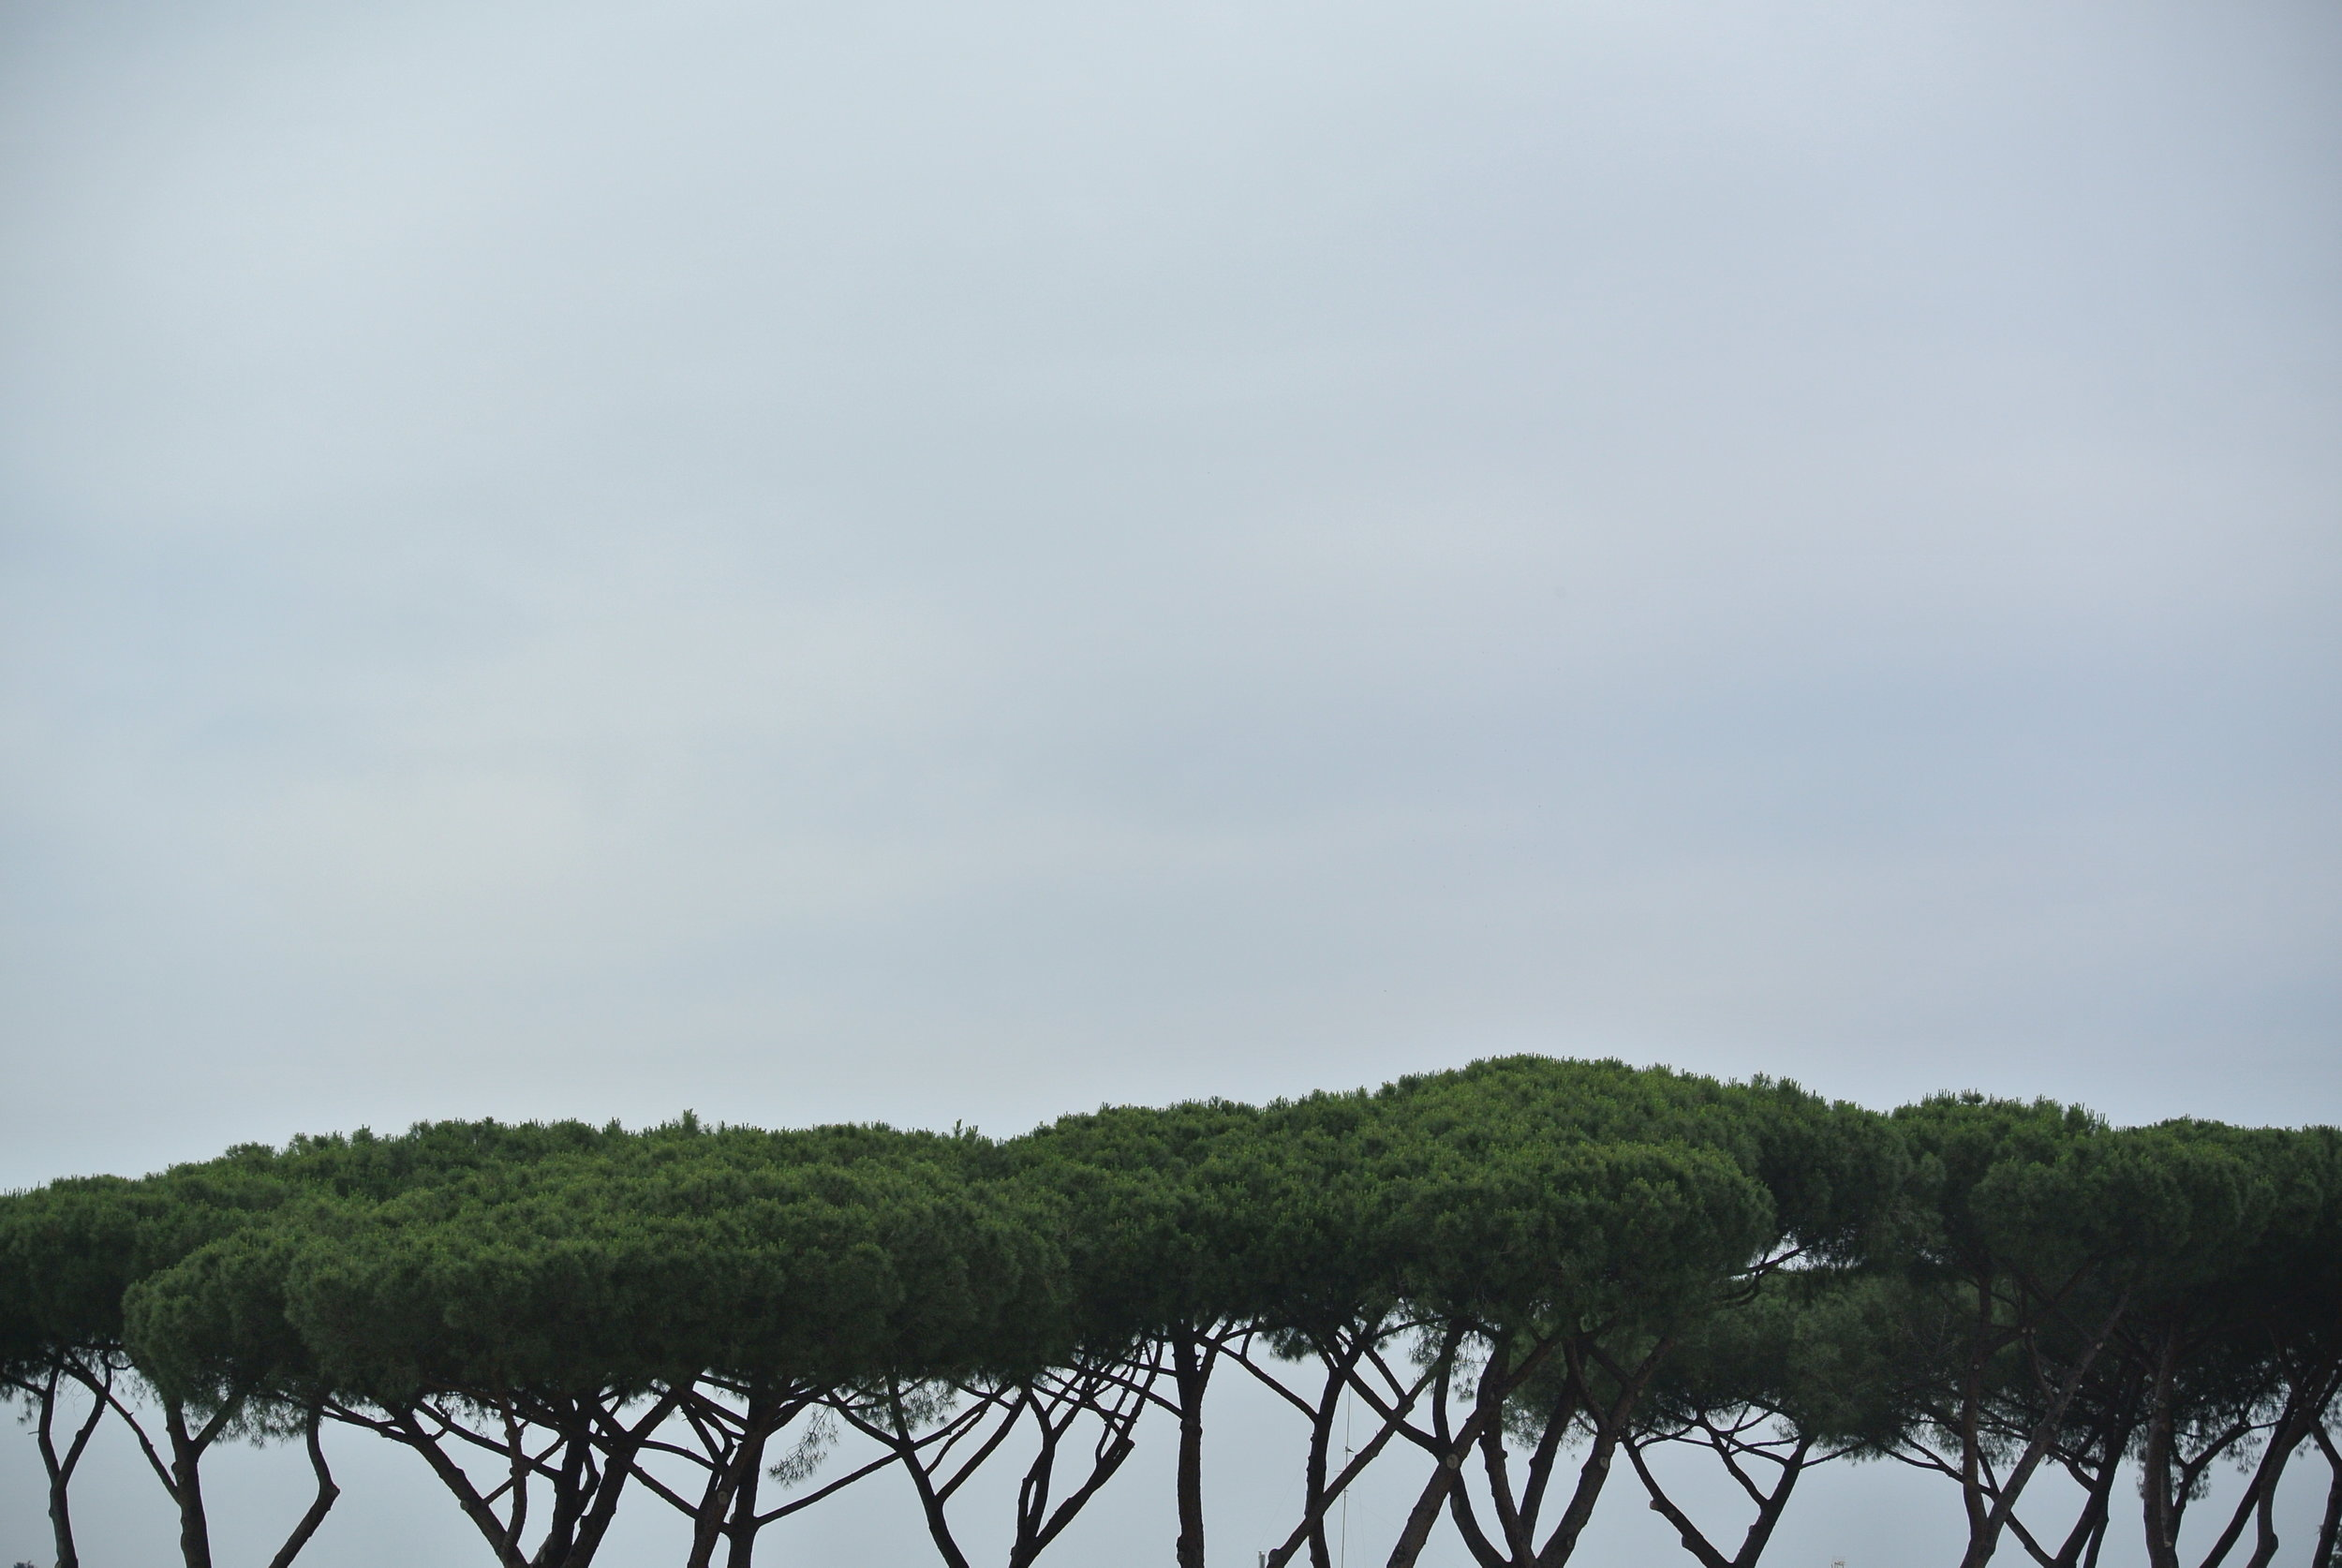 Meet George Jetson: pine trees on stilts to the stratosphere. Rome, EUR; May 2018.  ©Pamela Kerpius